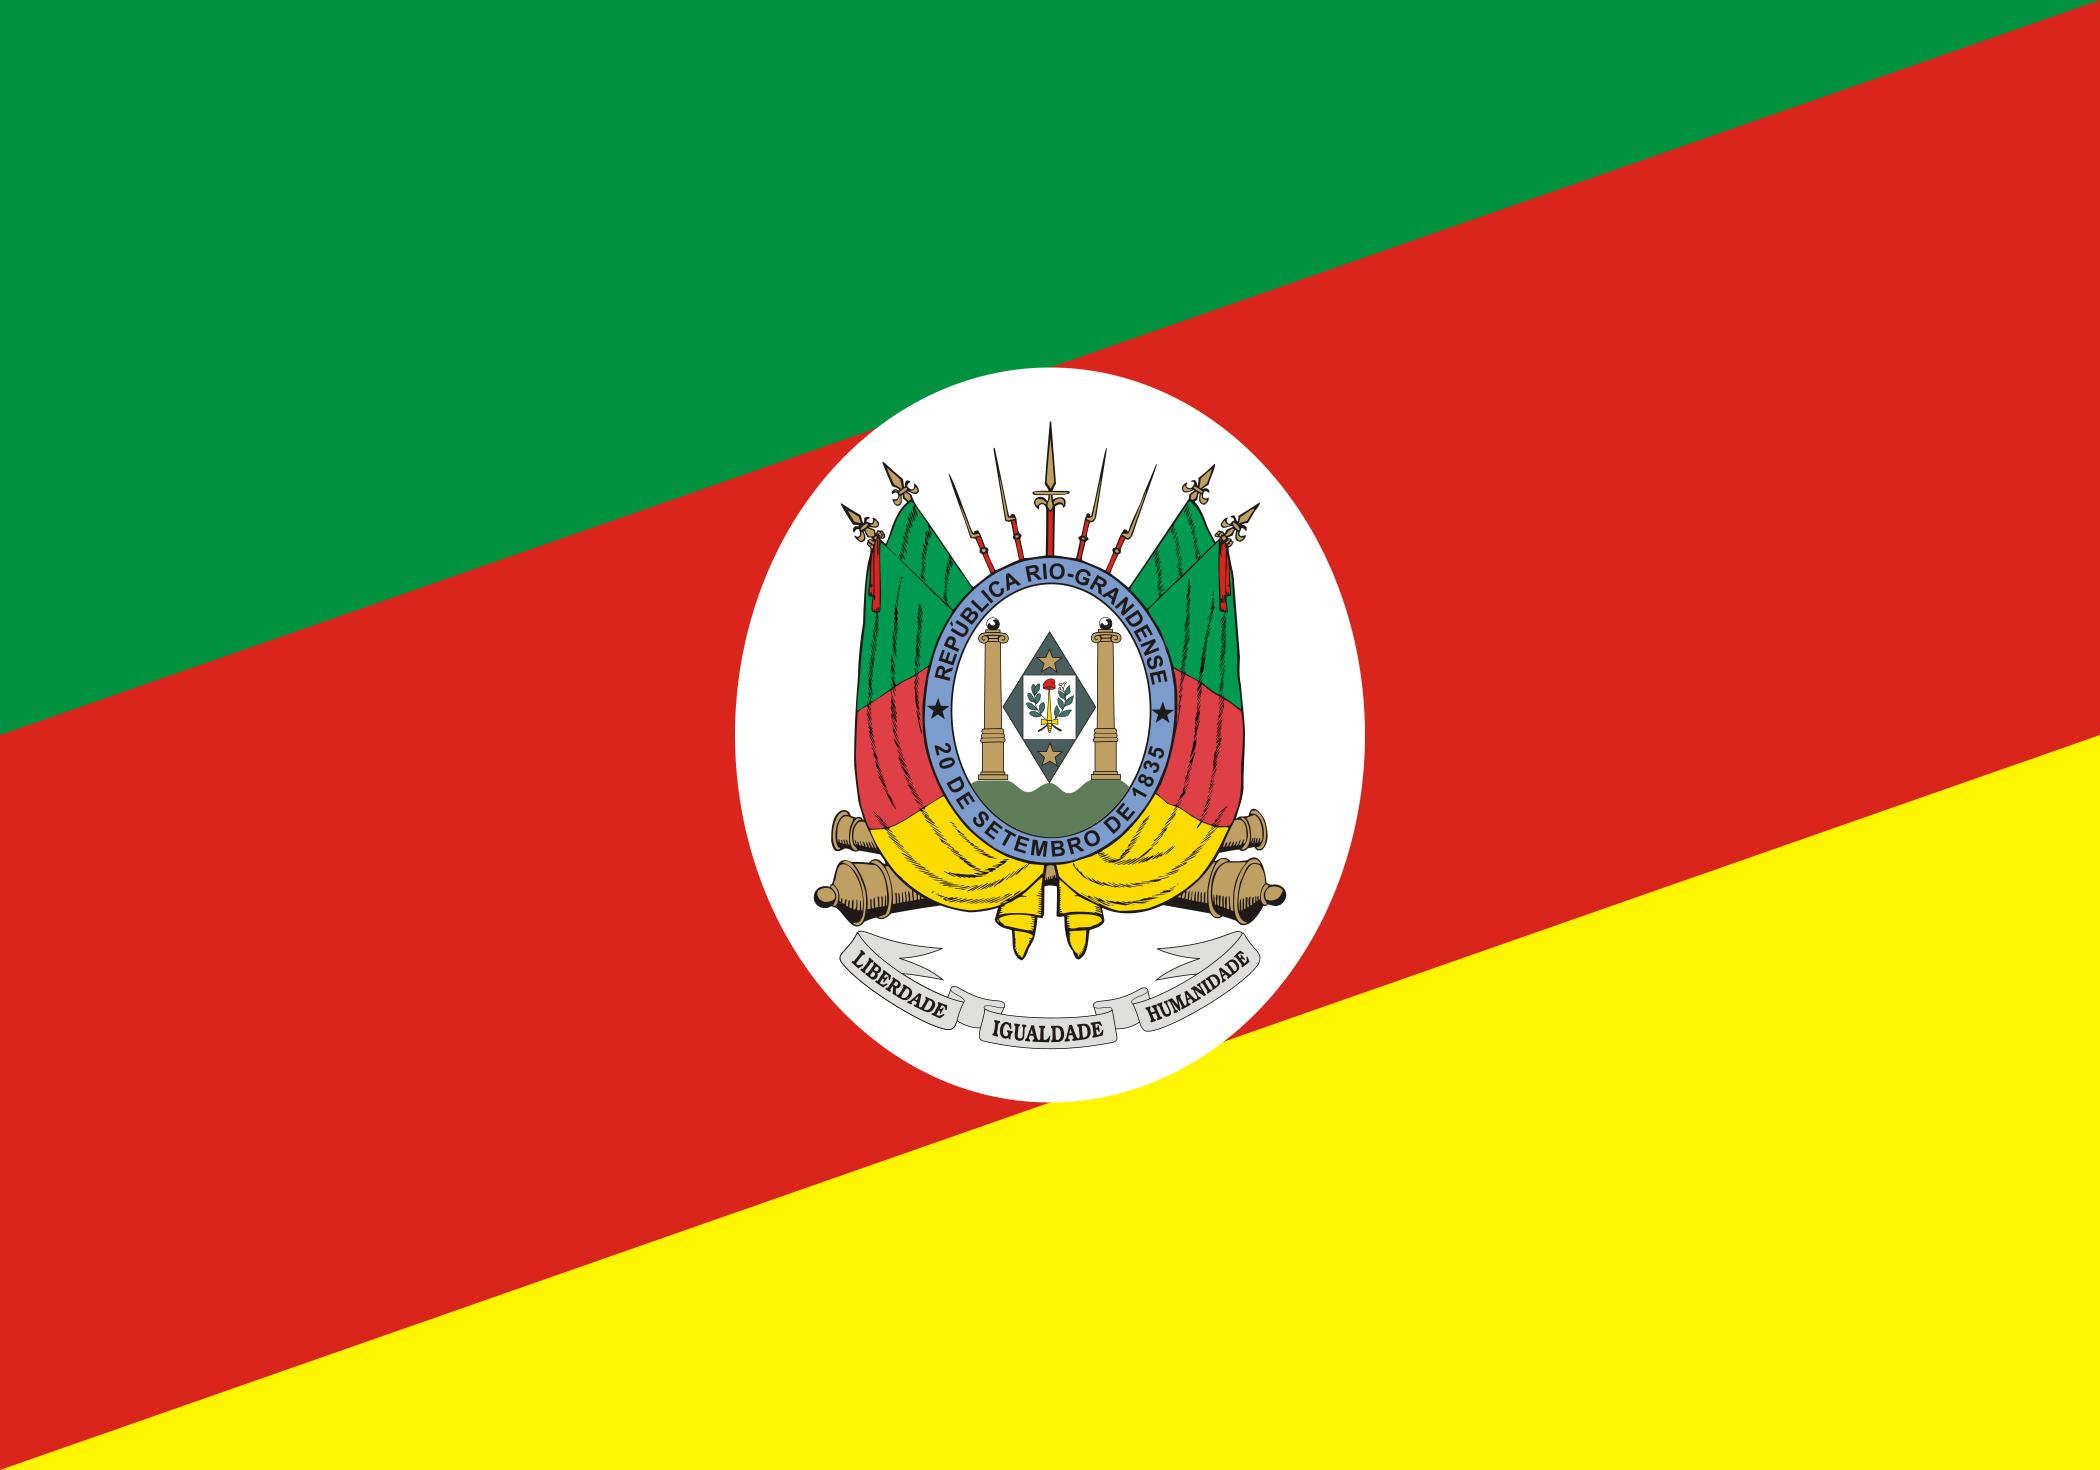 bandeira-do-estado-do-rio-grande-do-sul-1